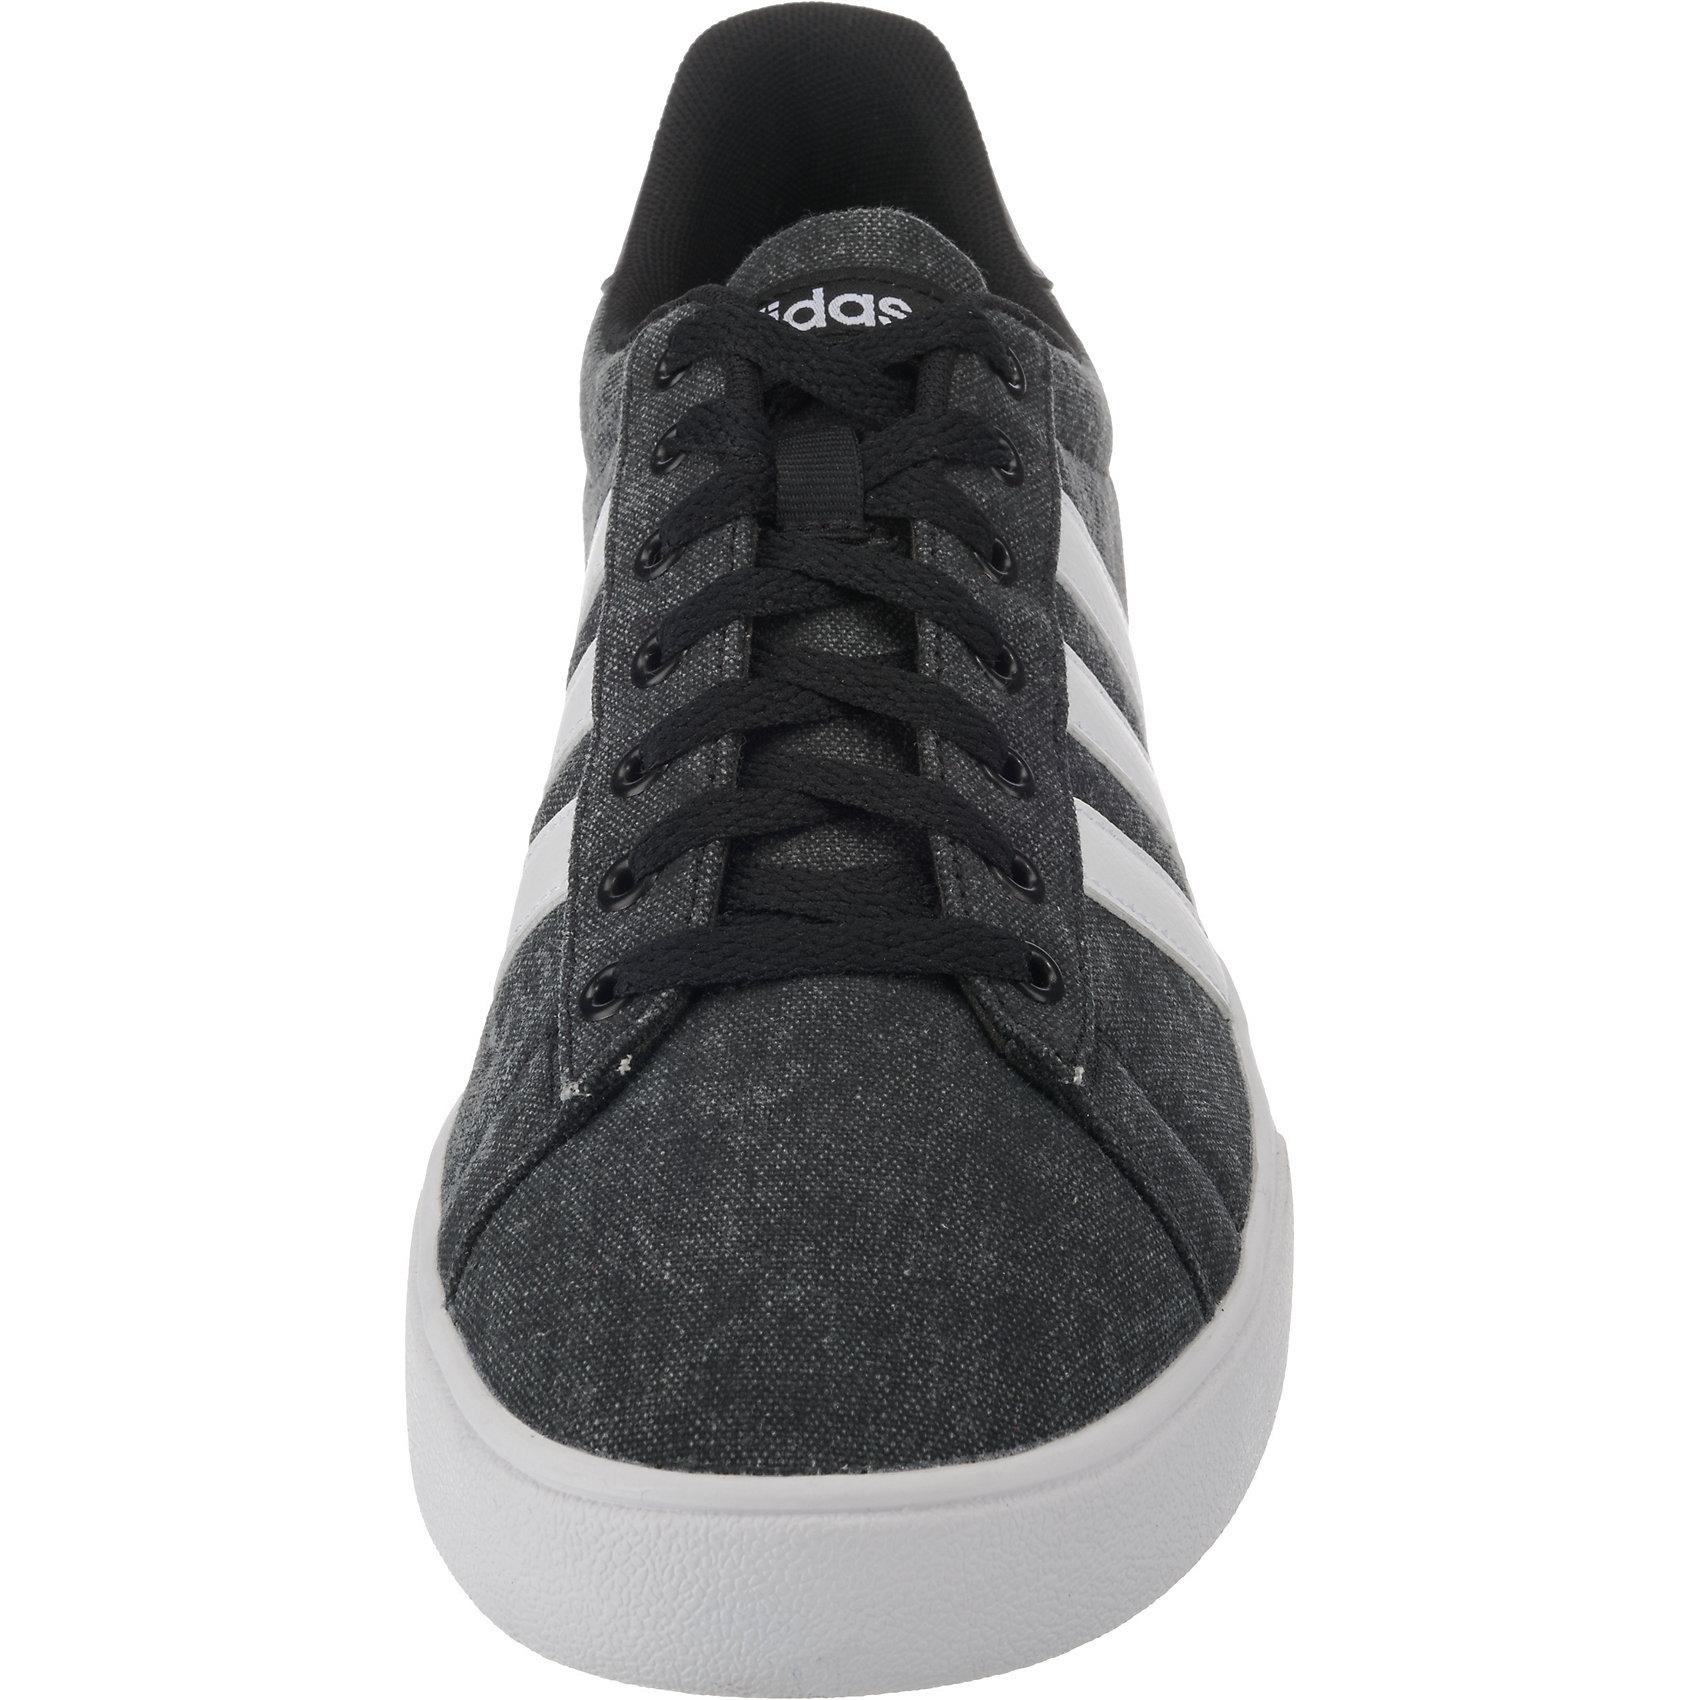 Tolle Adidas Superstar Vulc Adv Shoe Herren Adidas Casual